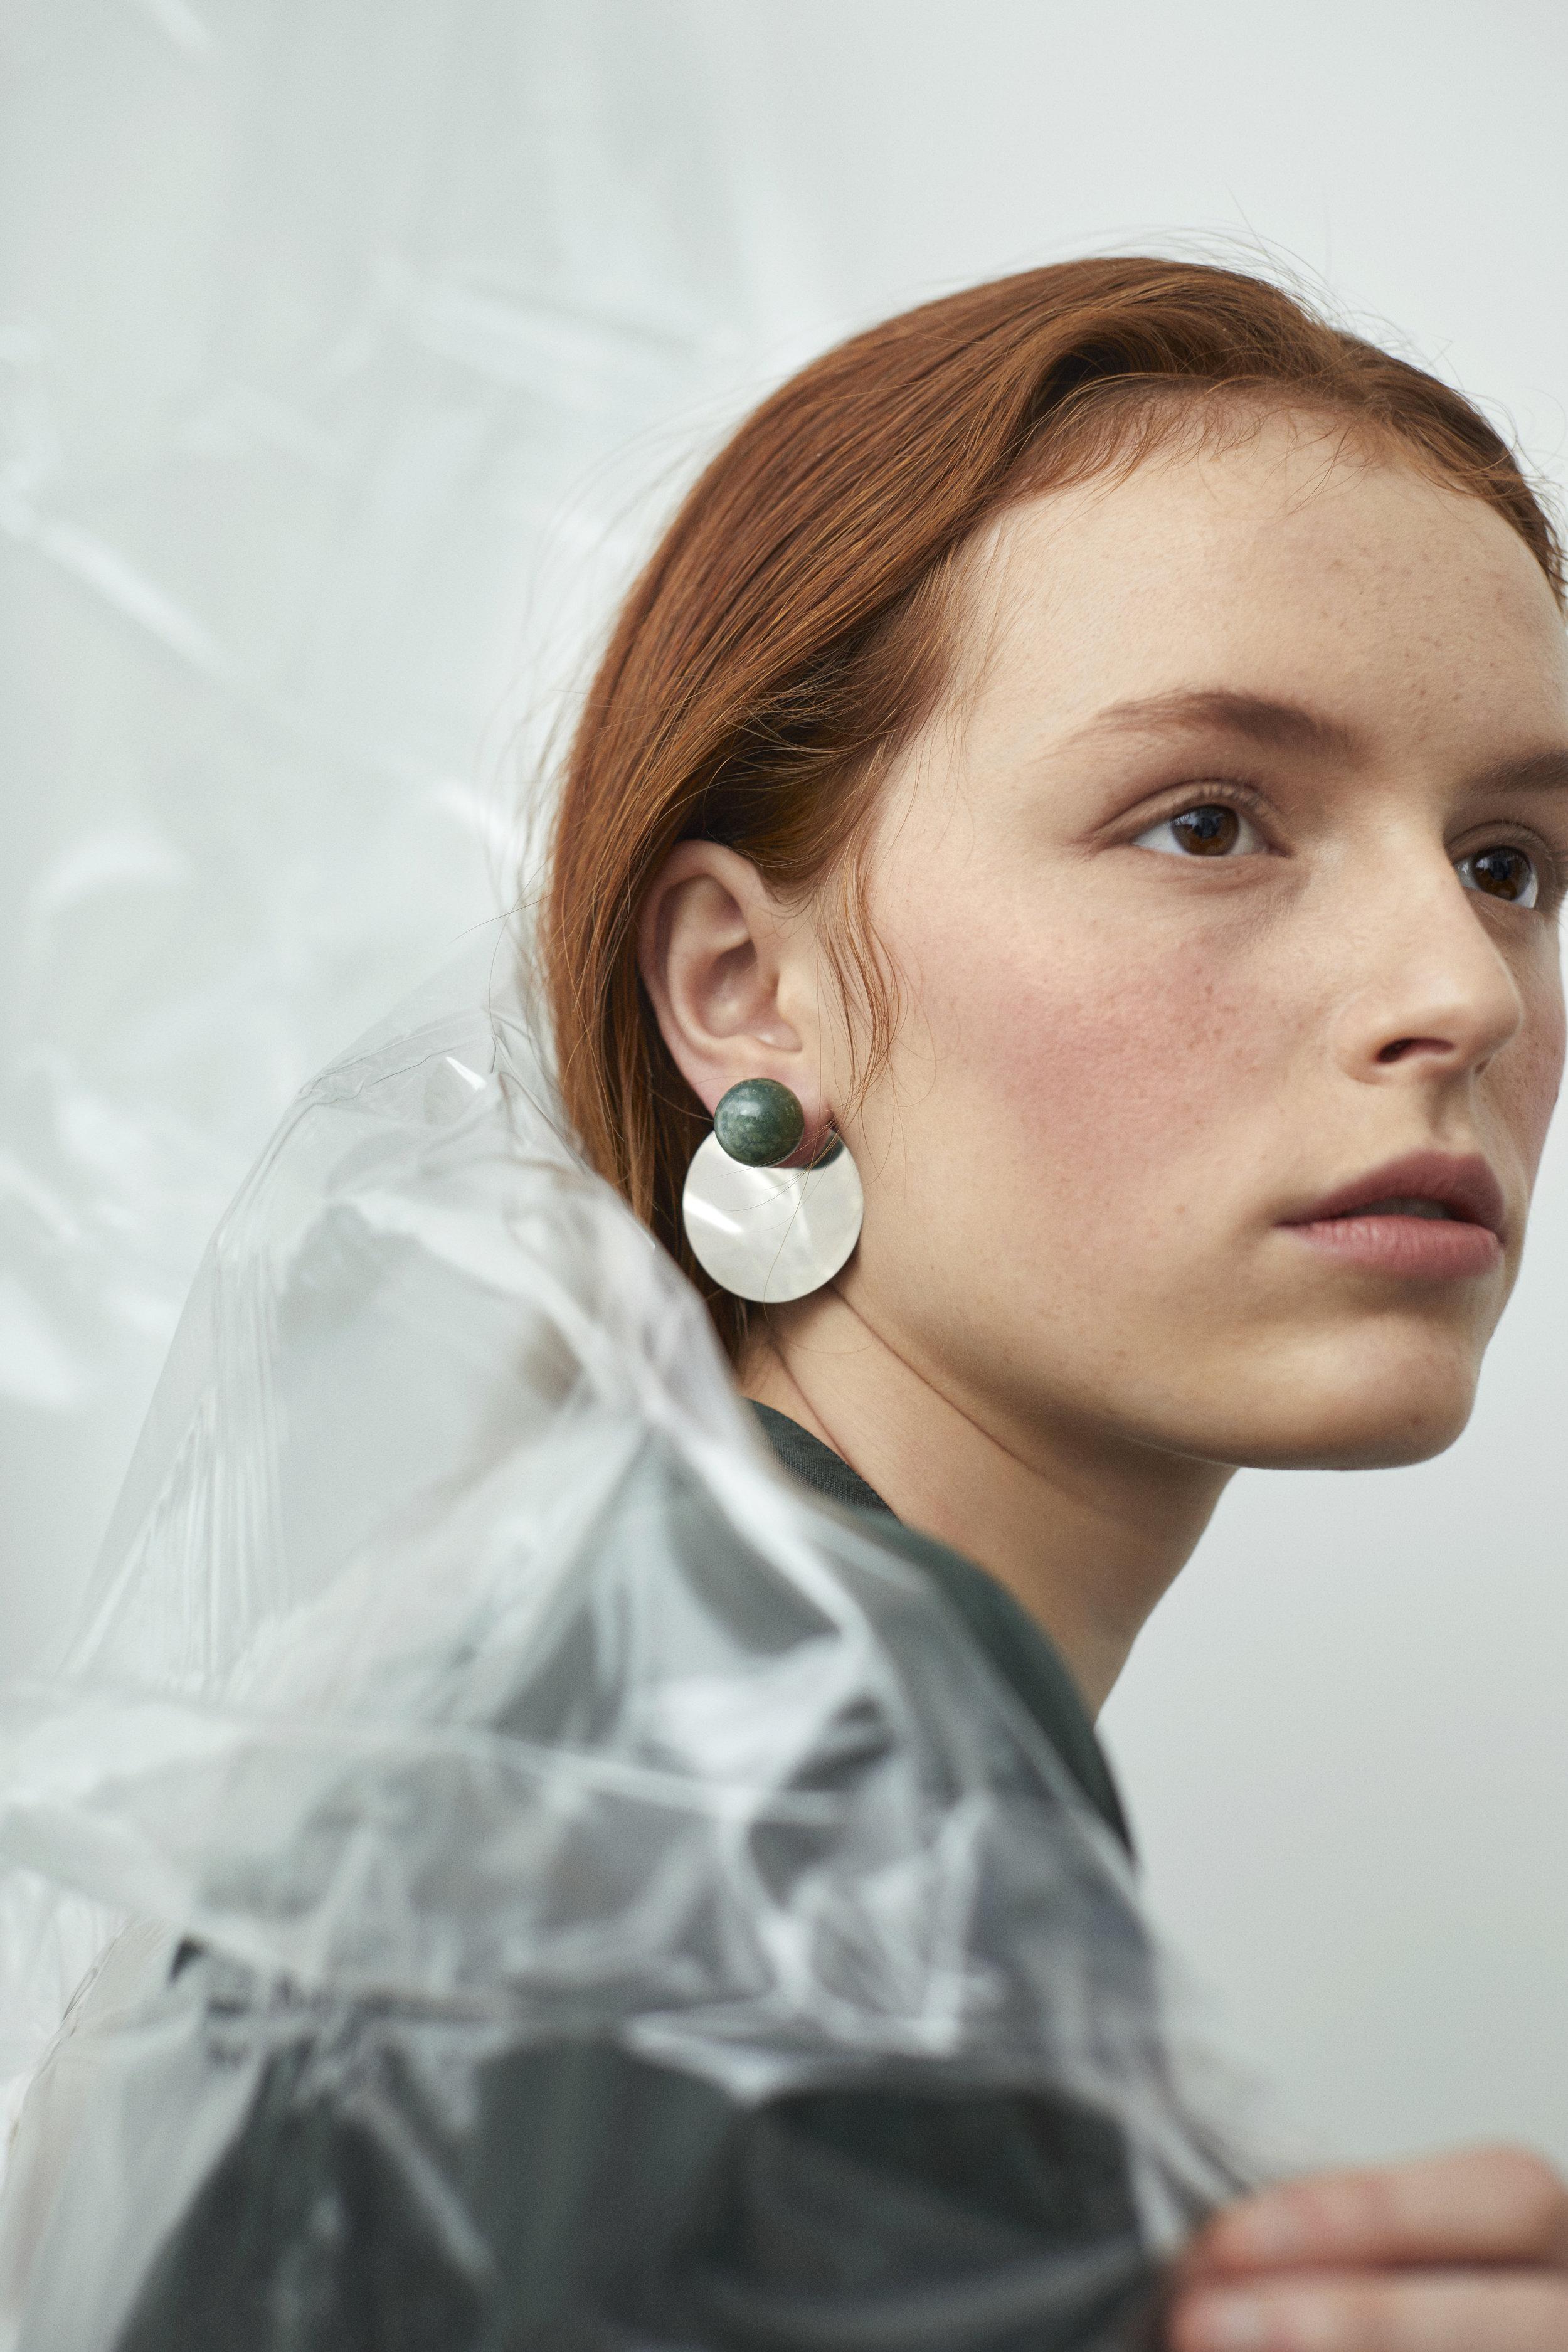 ▲ CONSONANCE earring set